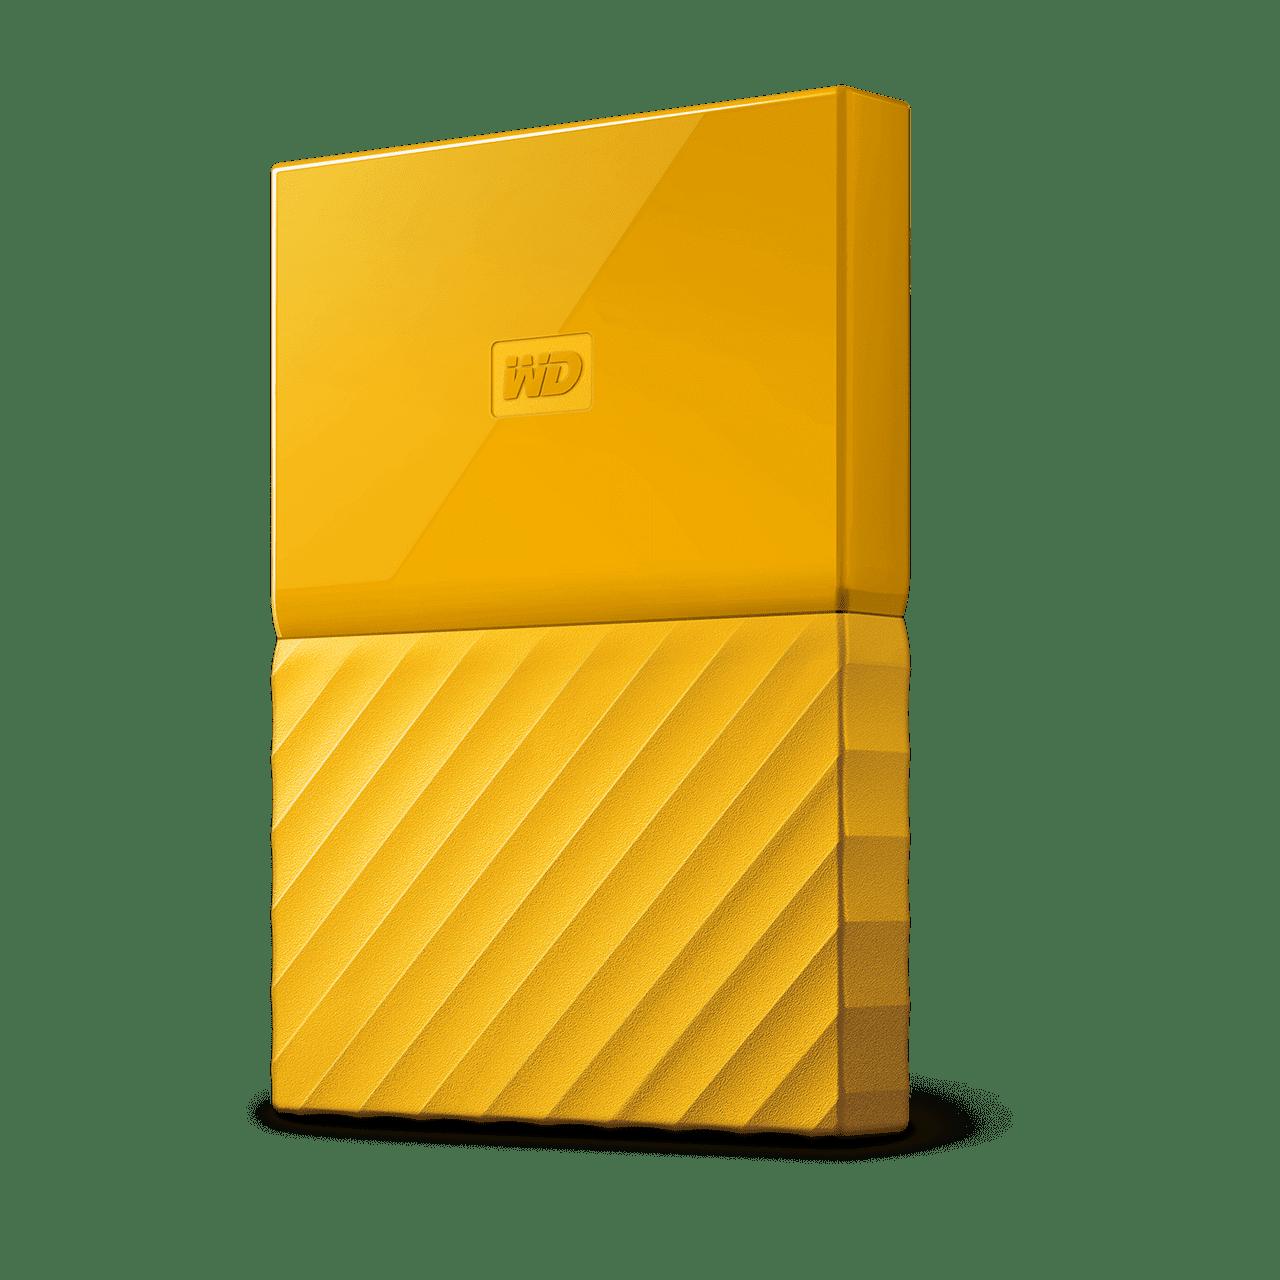 Western Digital 4TB My Passport USB3.0 External Hard Drive Yellow